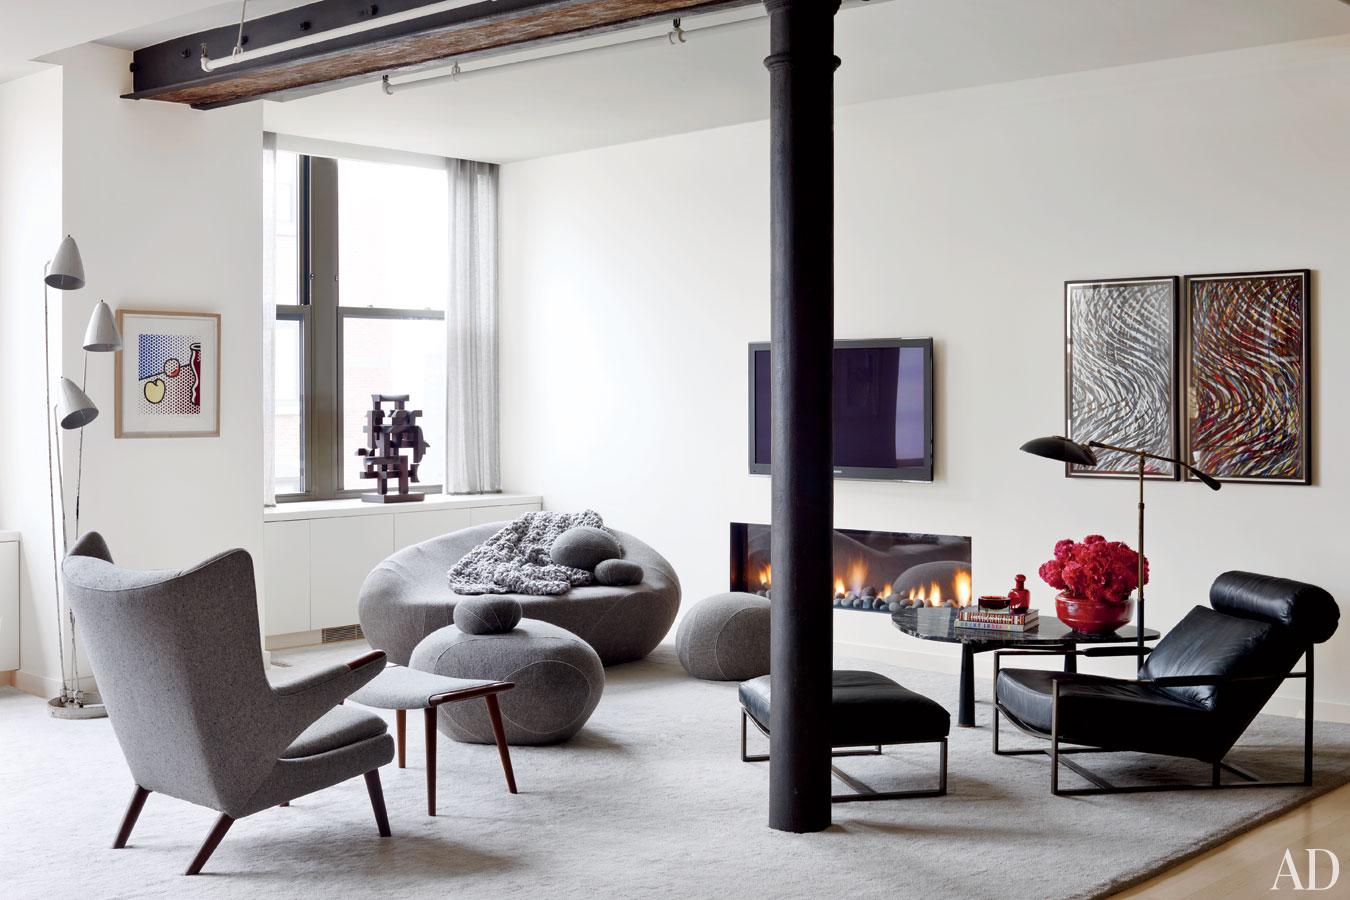 will-ferrell-01-living-room.jpg